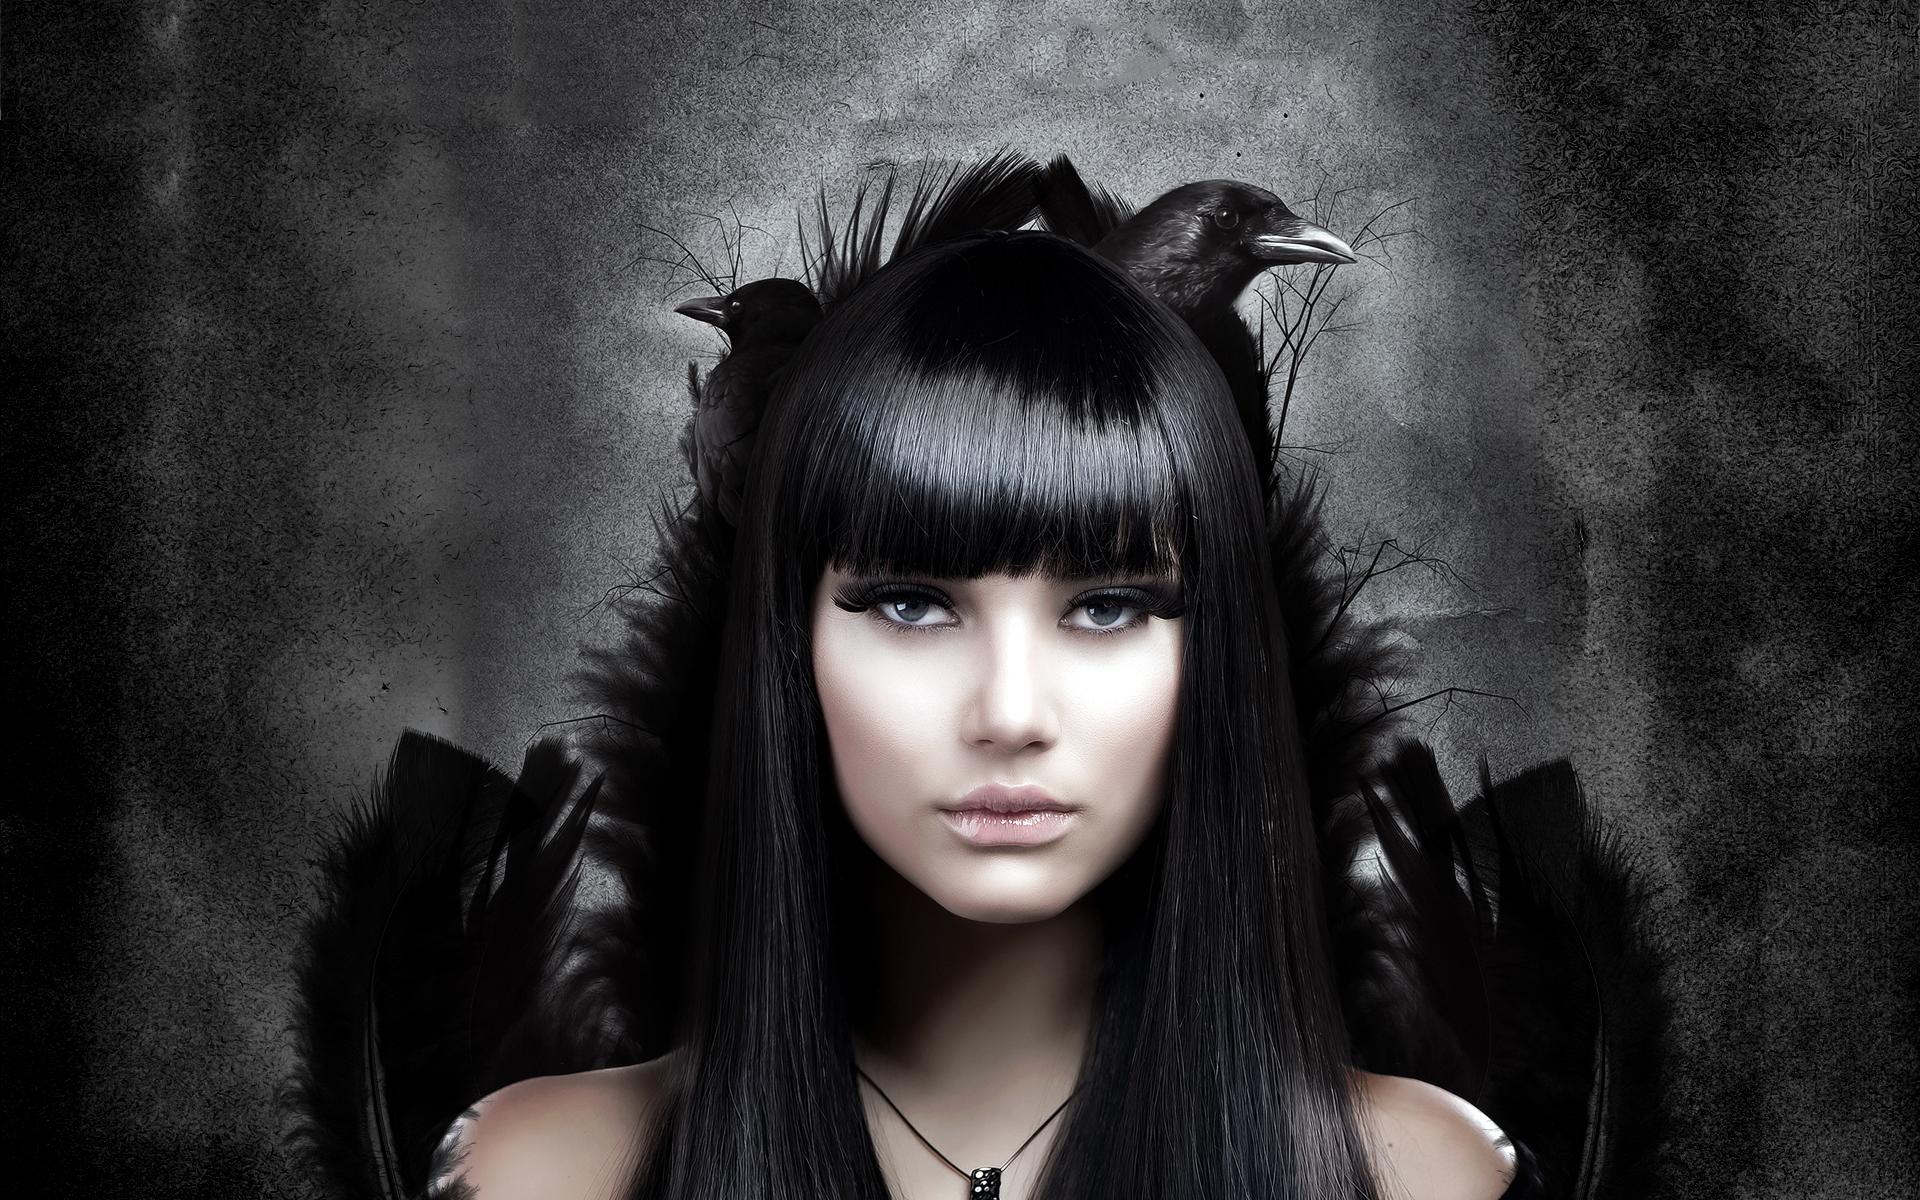 7026580-black-crow-girl